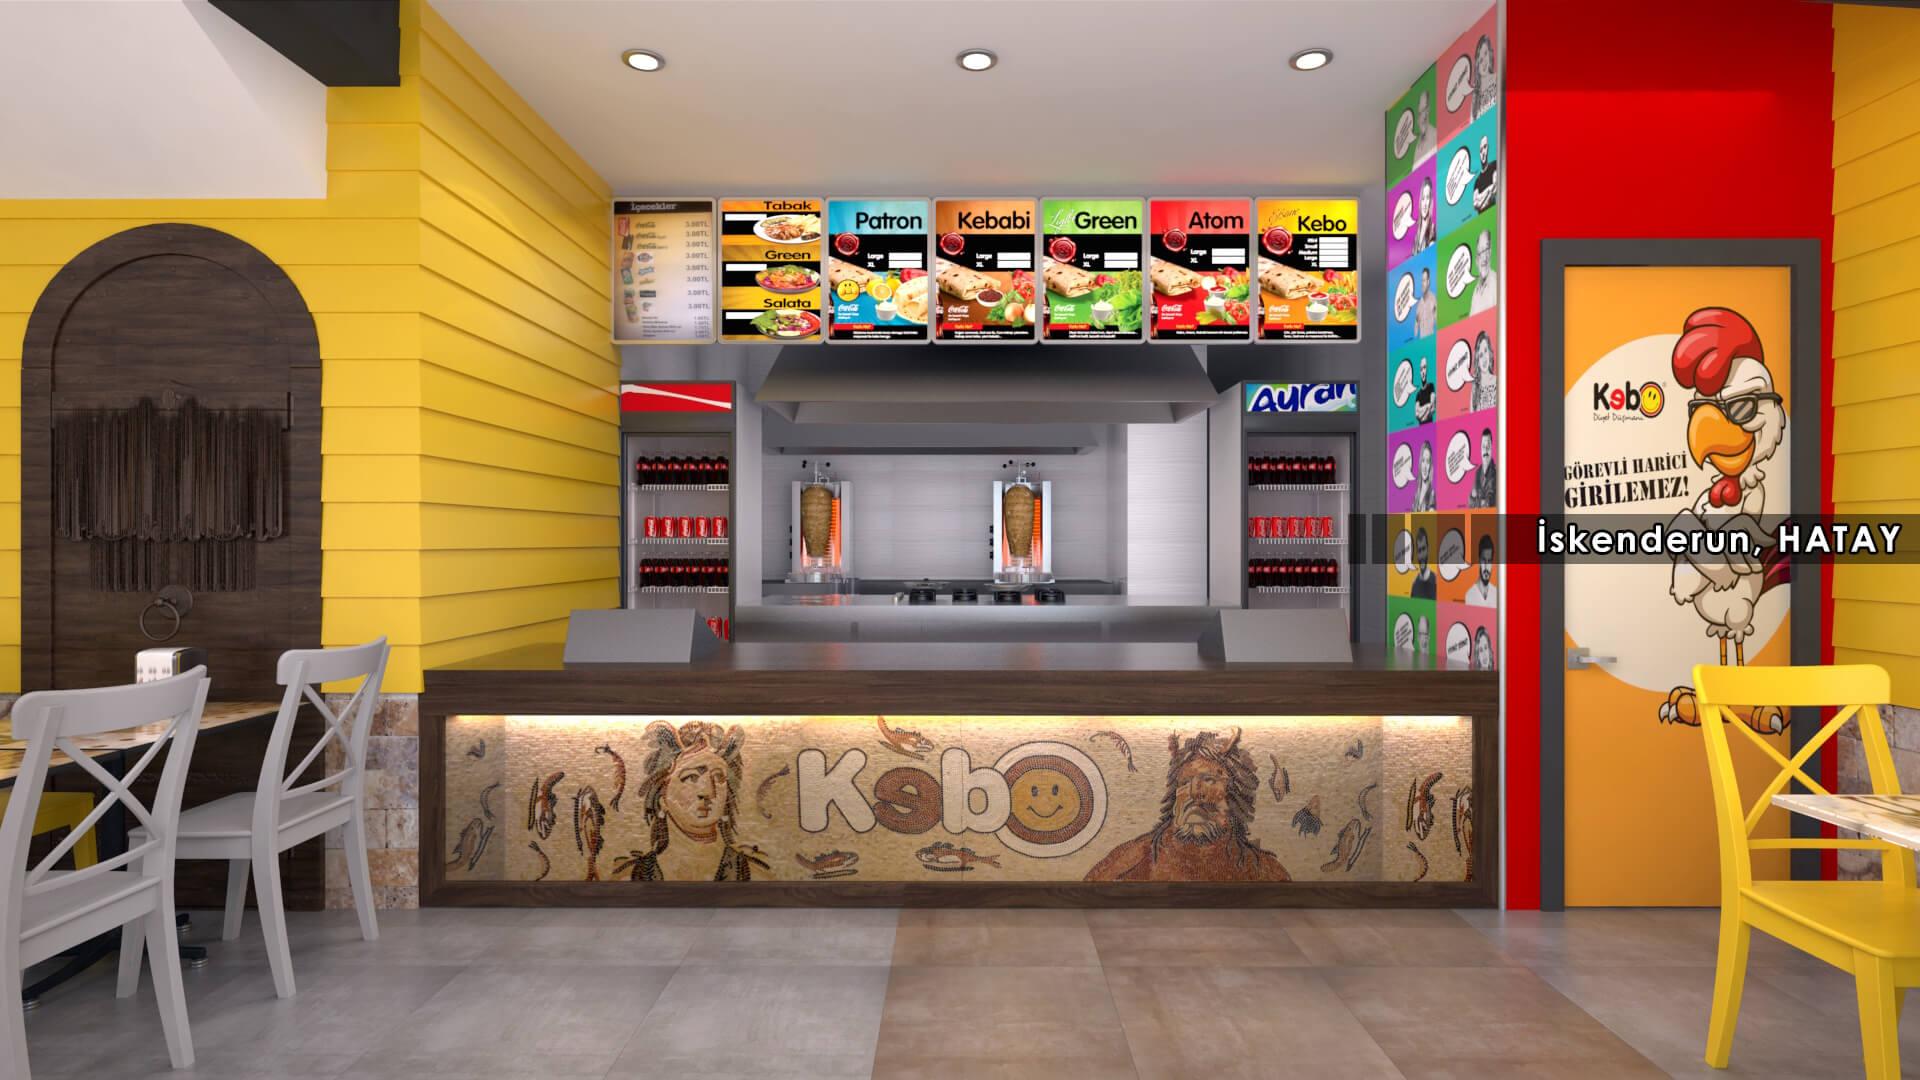 Restaurant interior design Kebo 2017